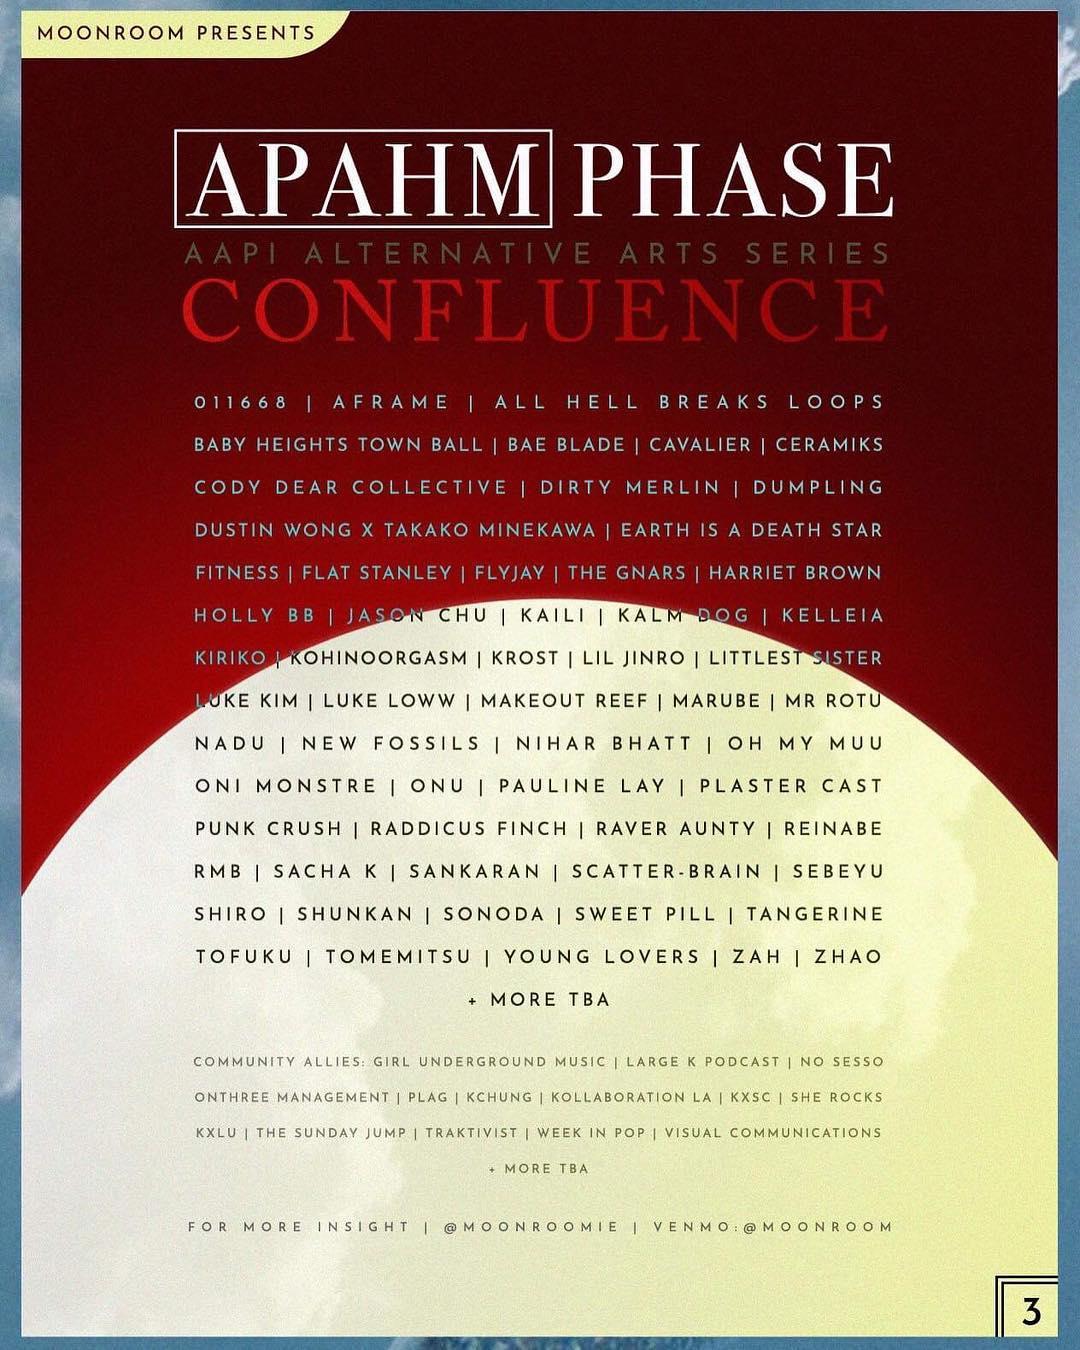 apahm phase confluence week in pop flyer.jpg